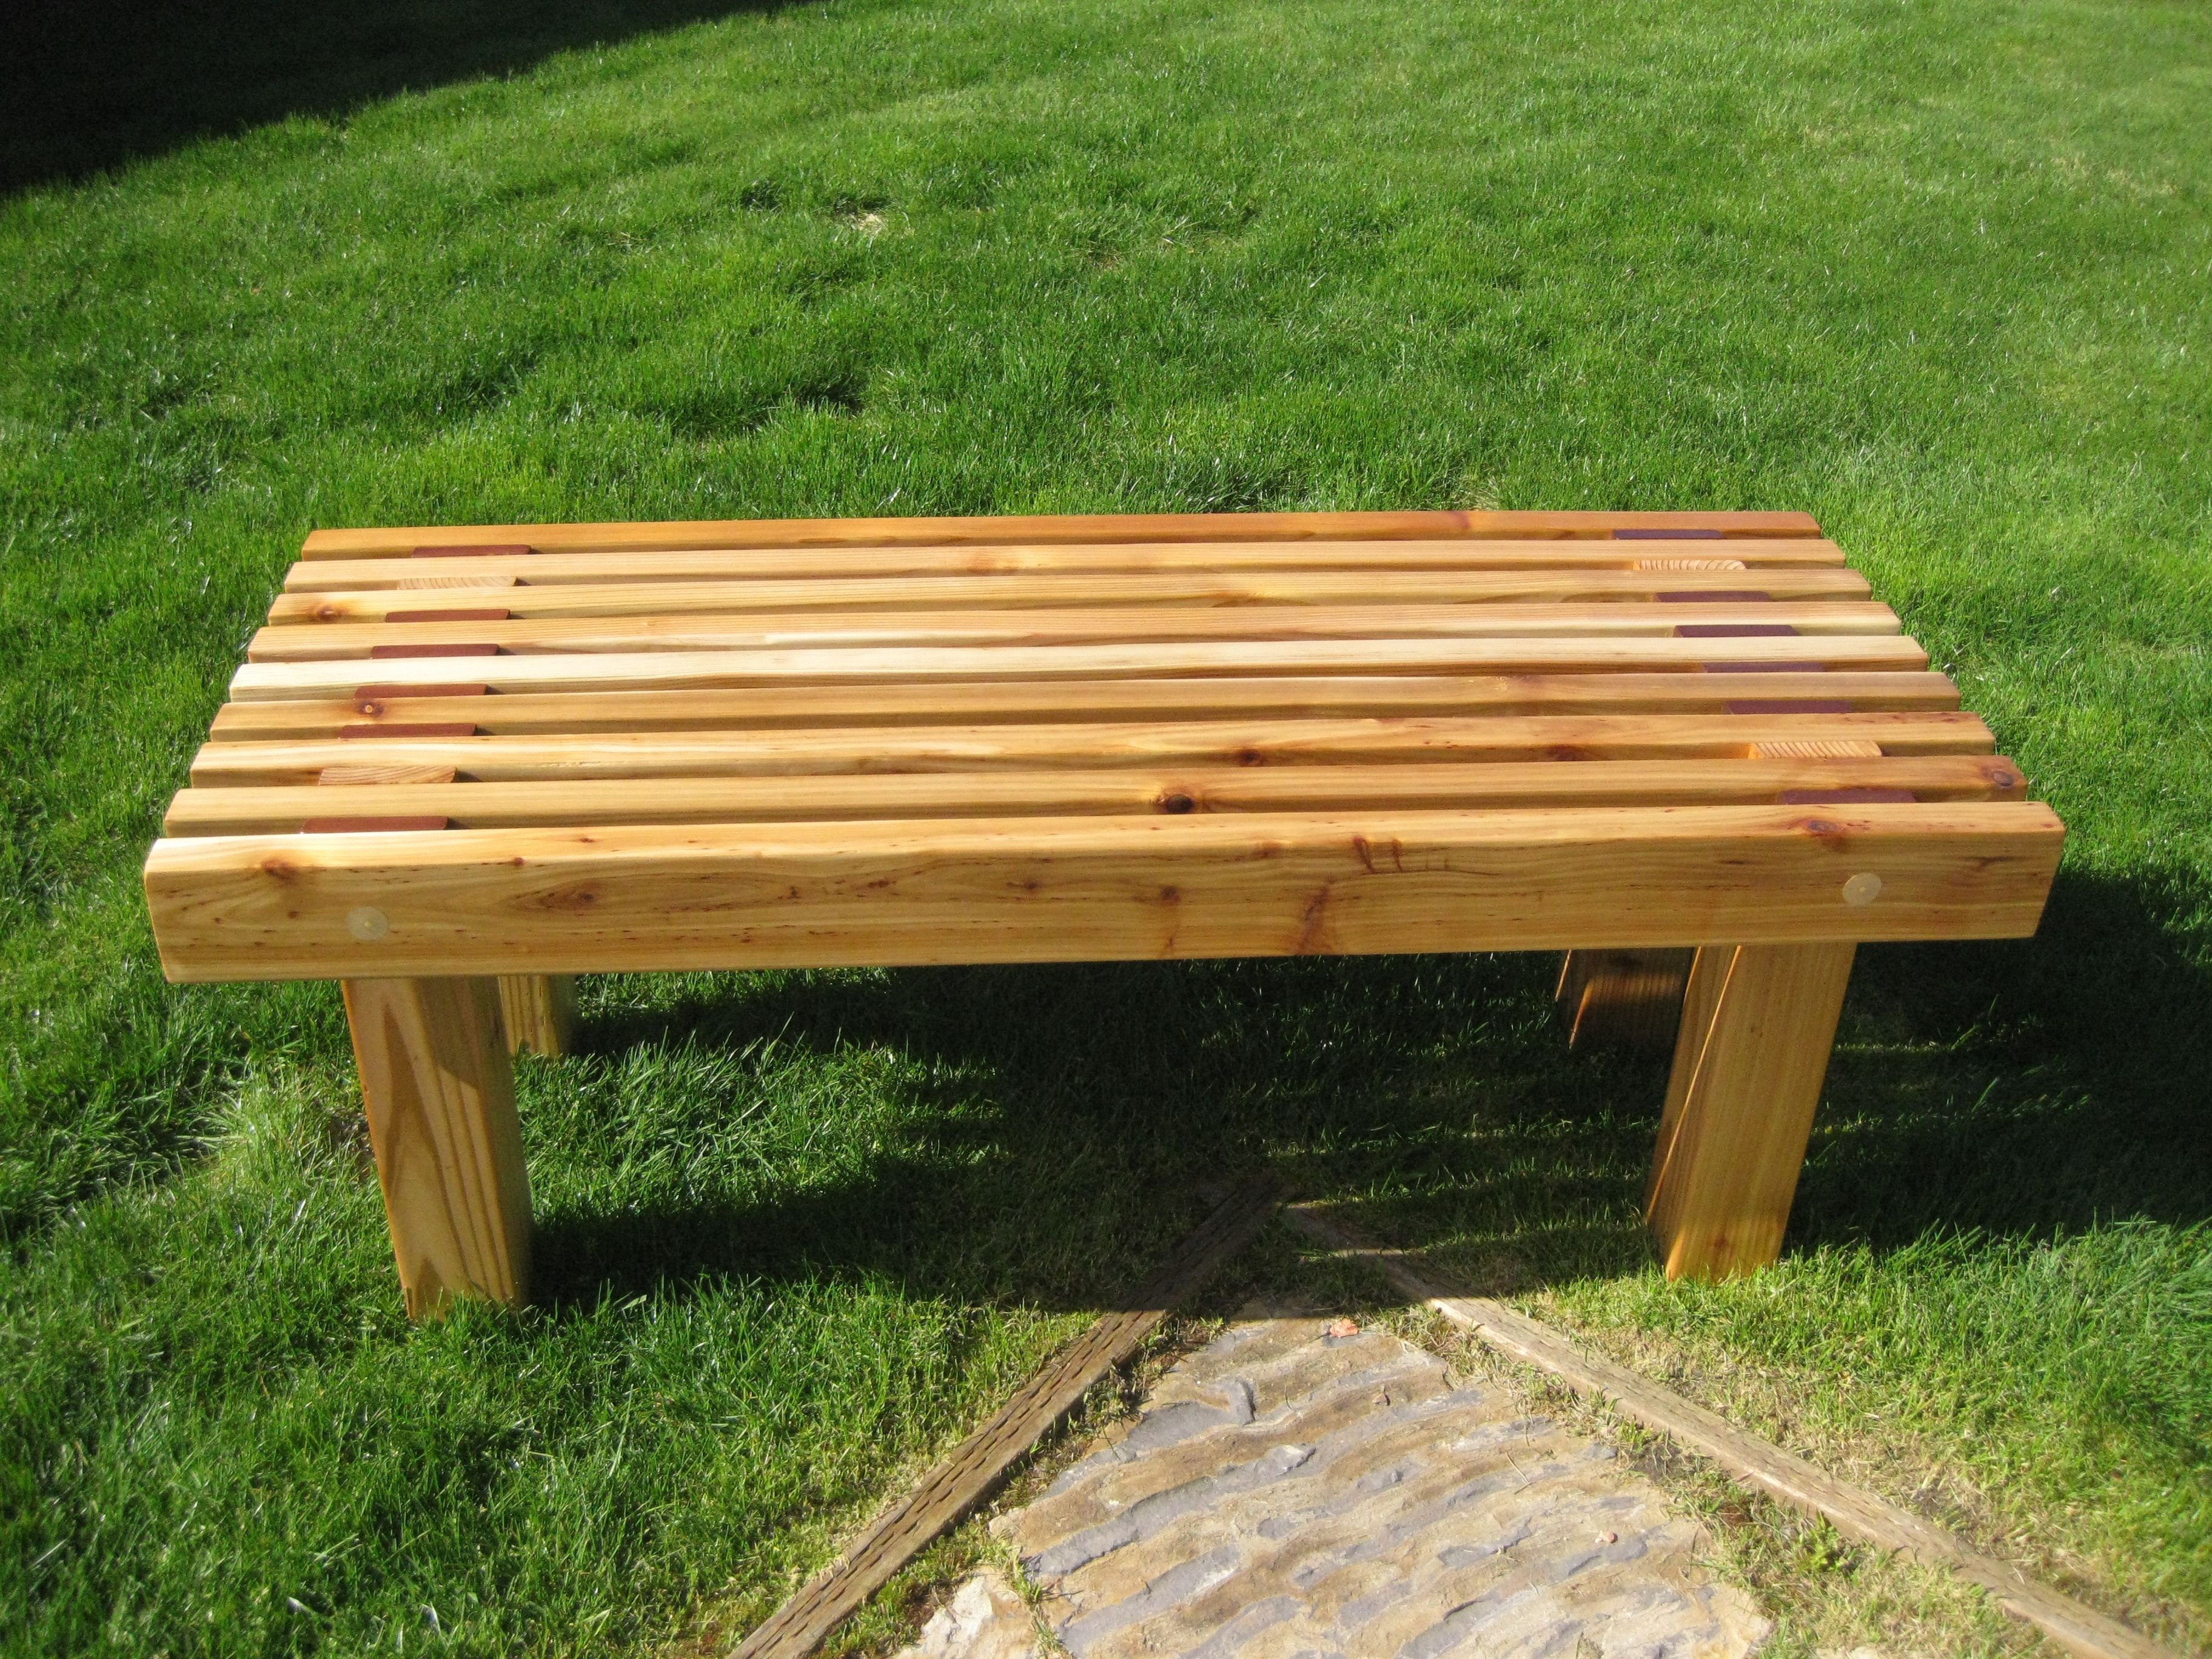 My Husband Made Plans From Popular Mechanics March Cedar - Popular mechanics picnic table